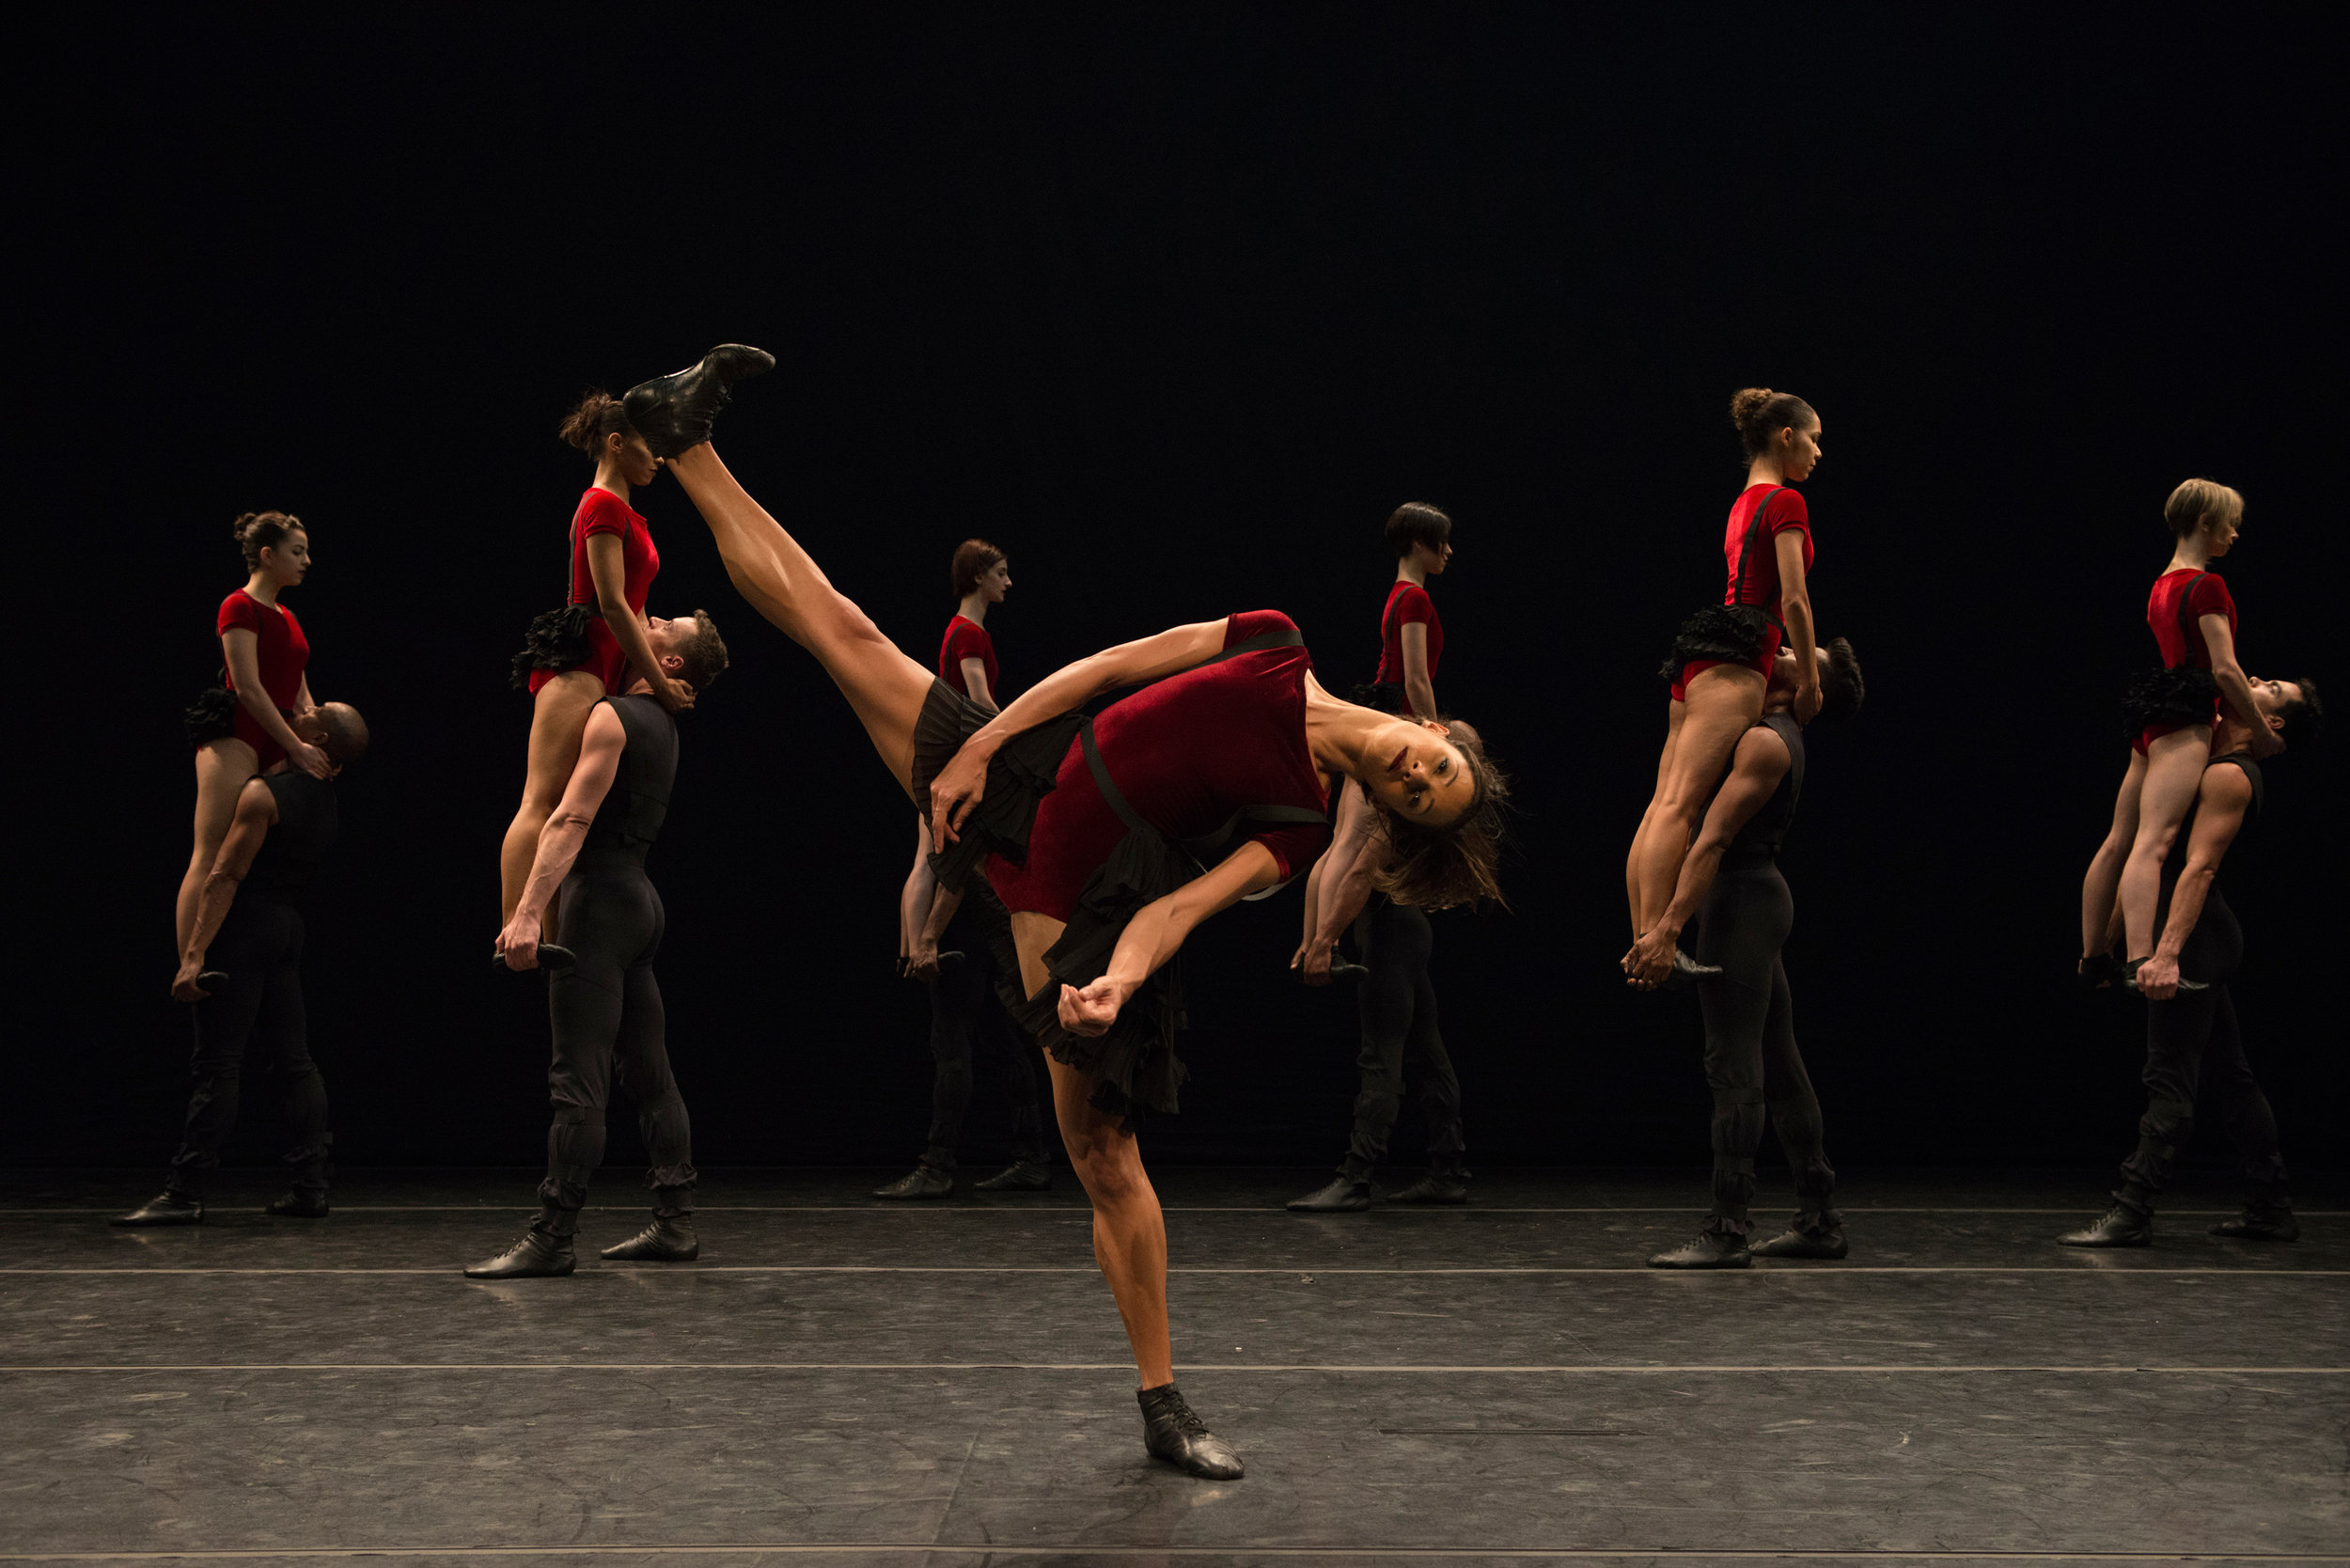 Grupo Corpo performs 'Danca Sinfonica' by Rodrigo Pederneiras. Photo by Jose Luiz Pederneiras